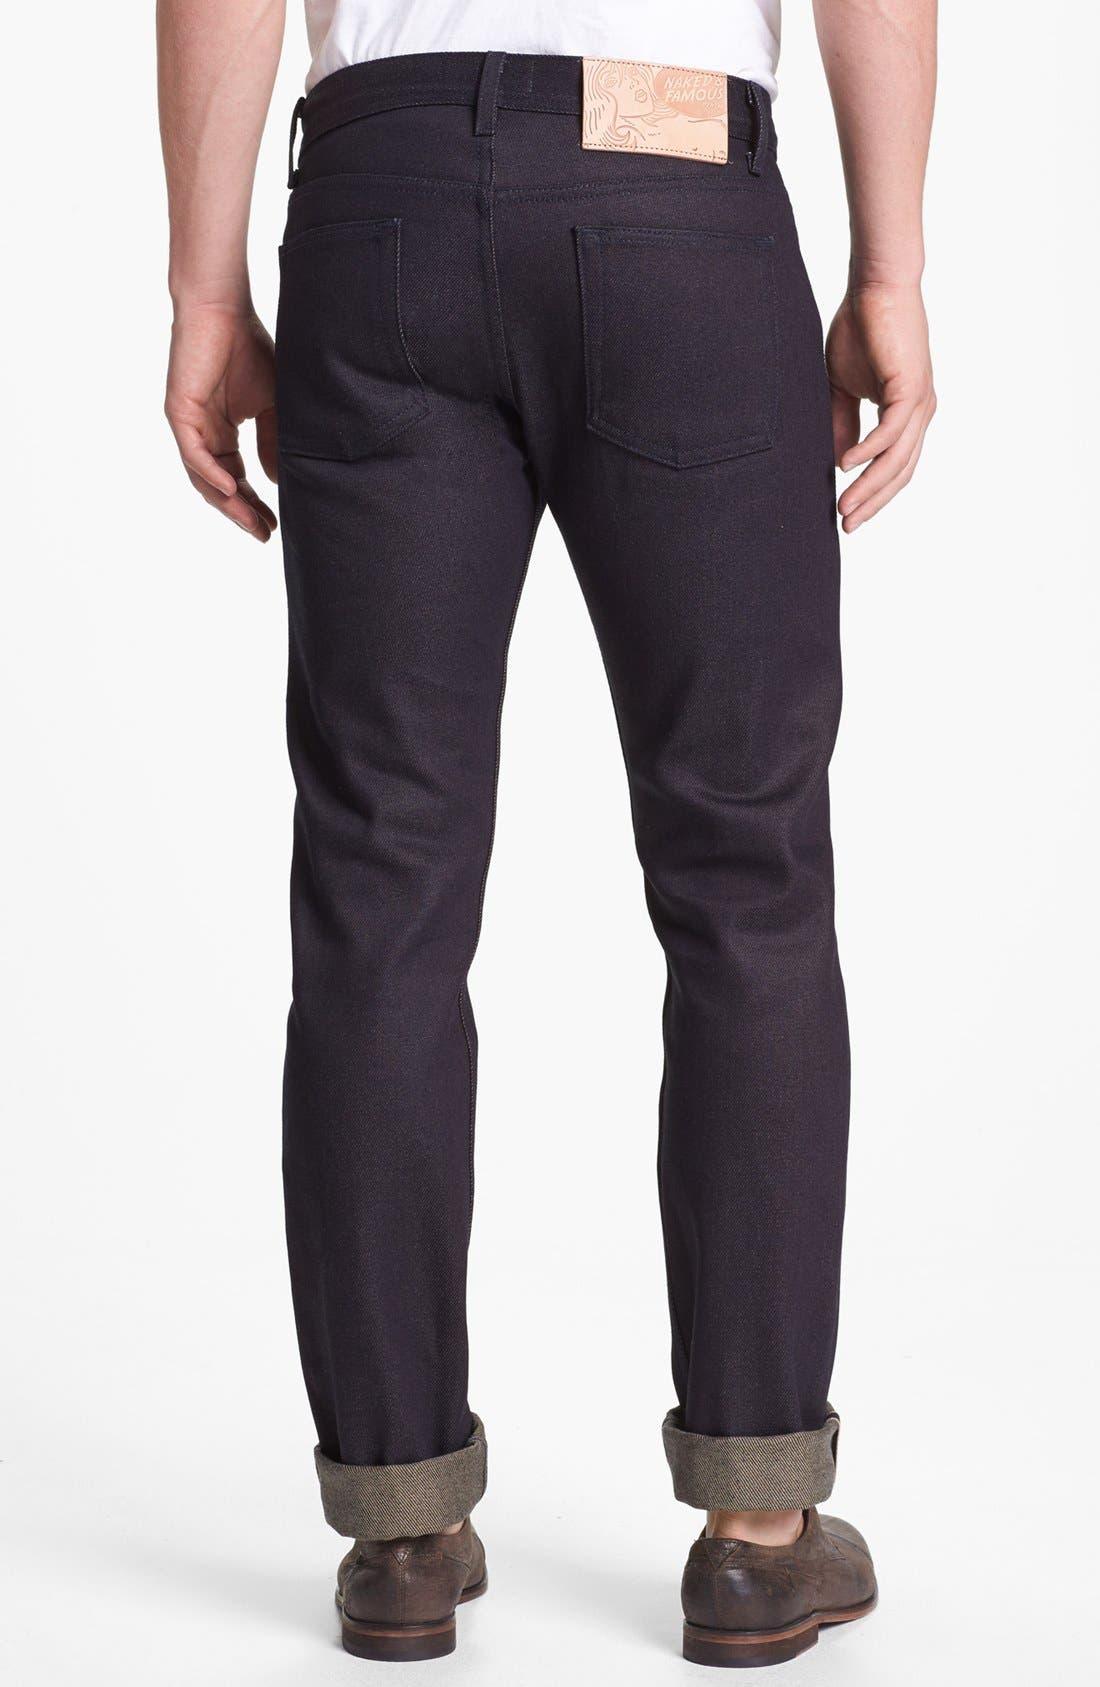 Alternate Image 1 Selected - Naked & Famous Denim 'Weird Guy' Slim Fit Selvedge Jeans (Elephant 3)